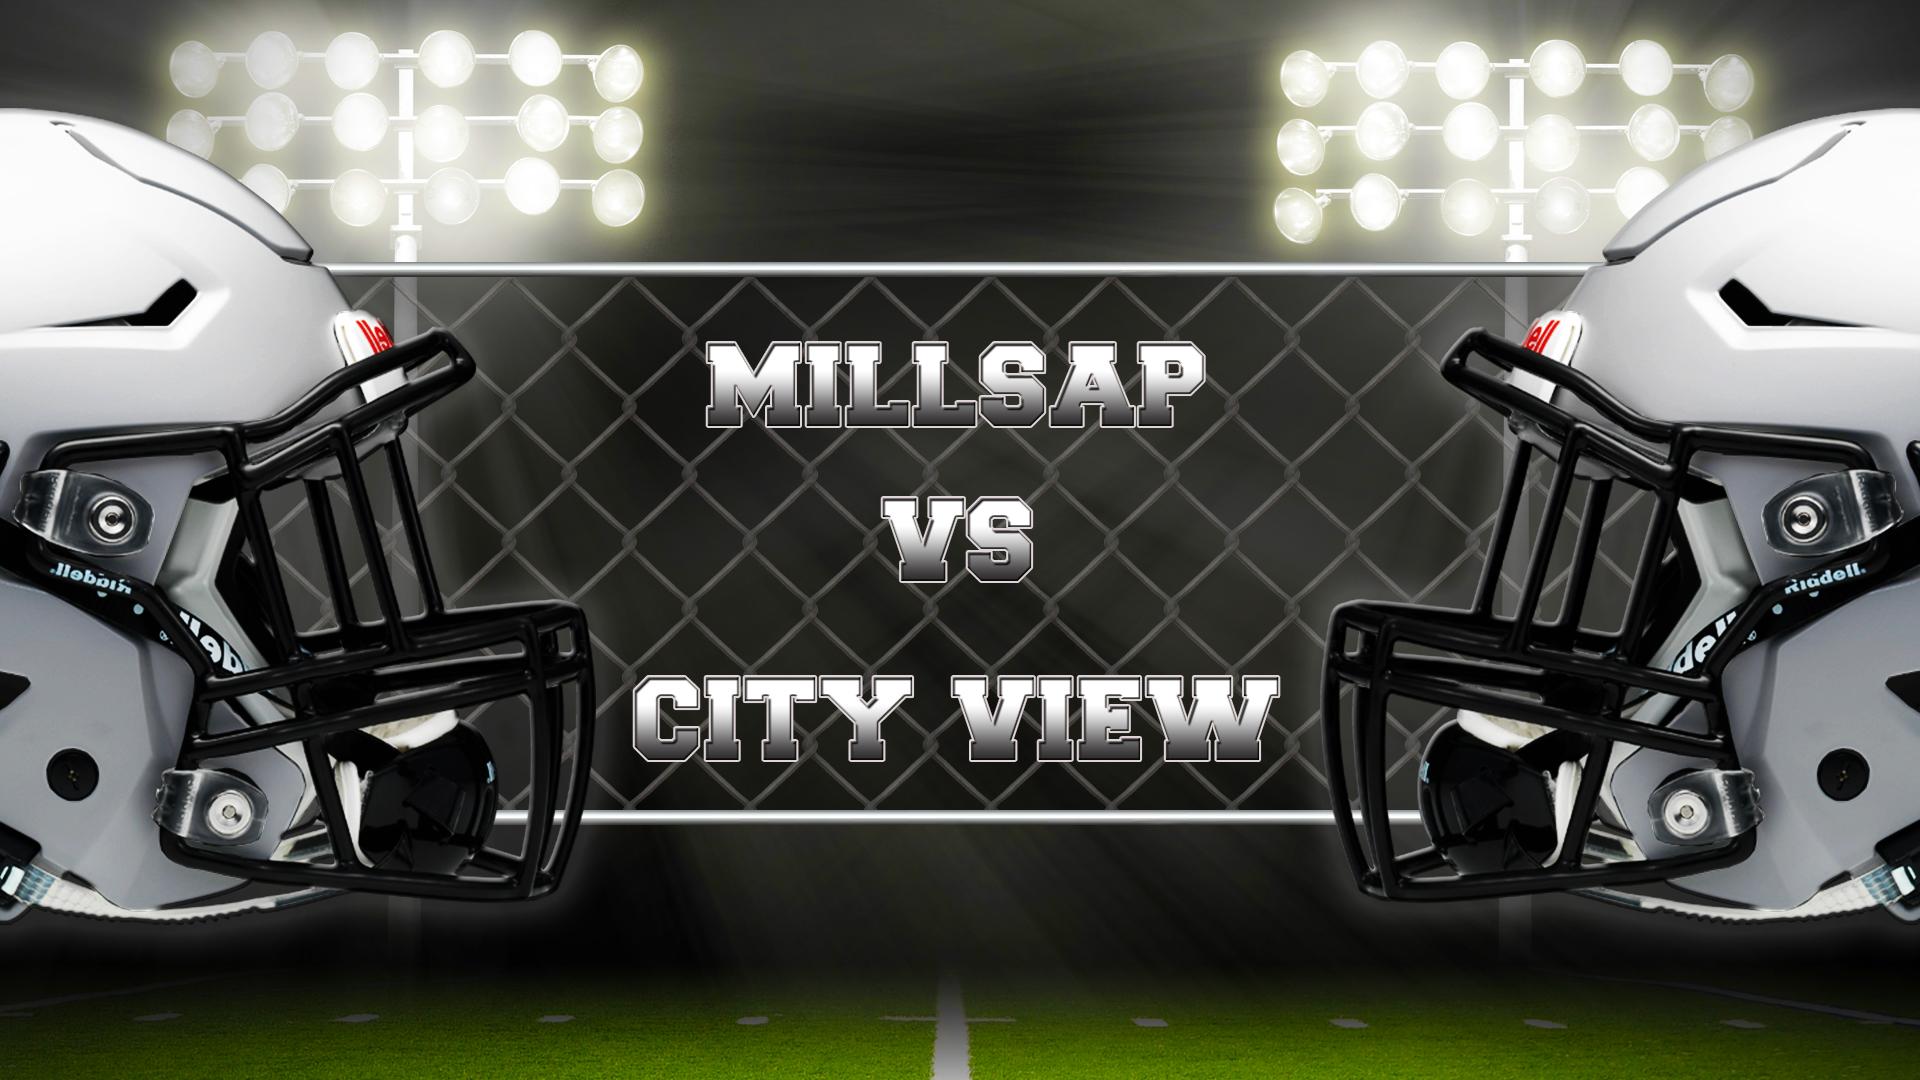 Millsap vs City View_1475767390914.jpg